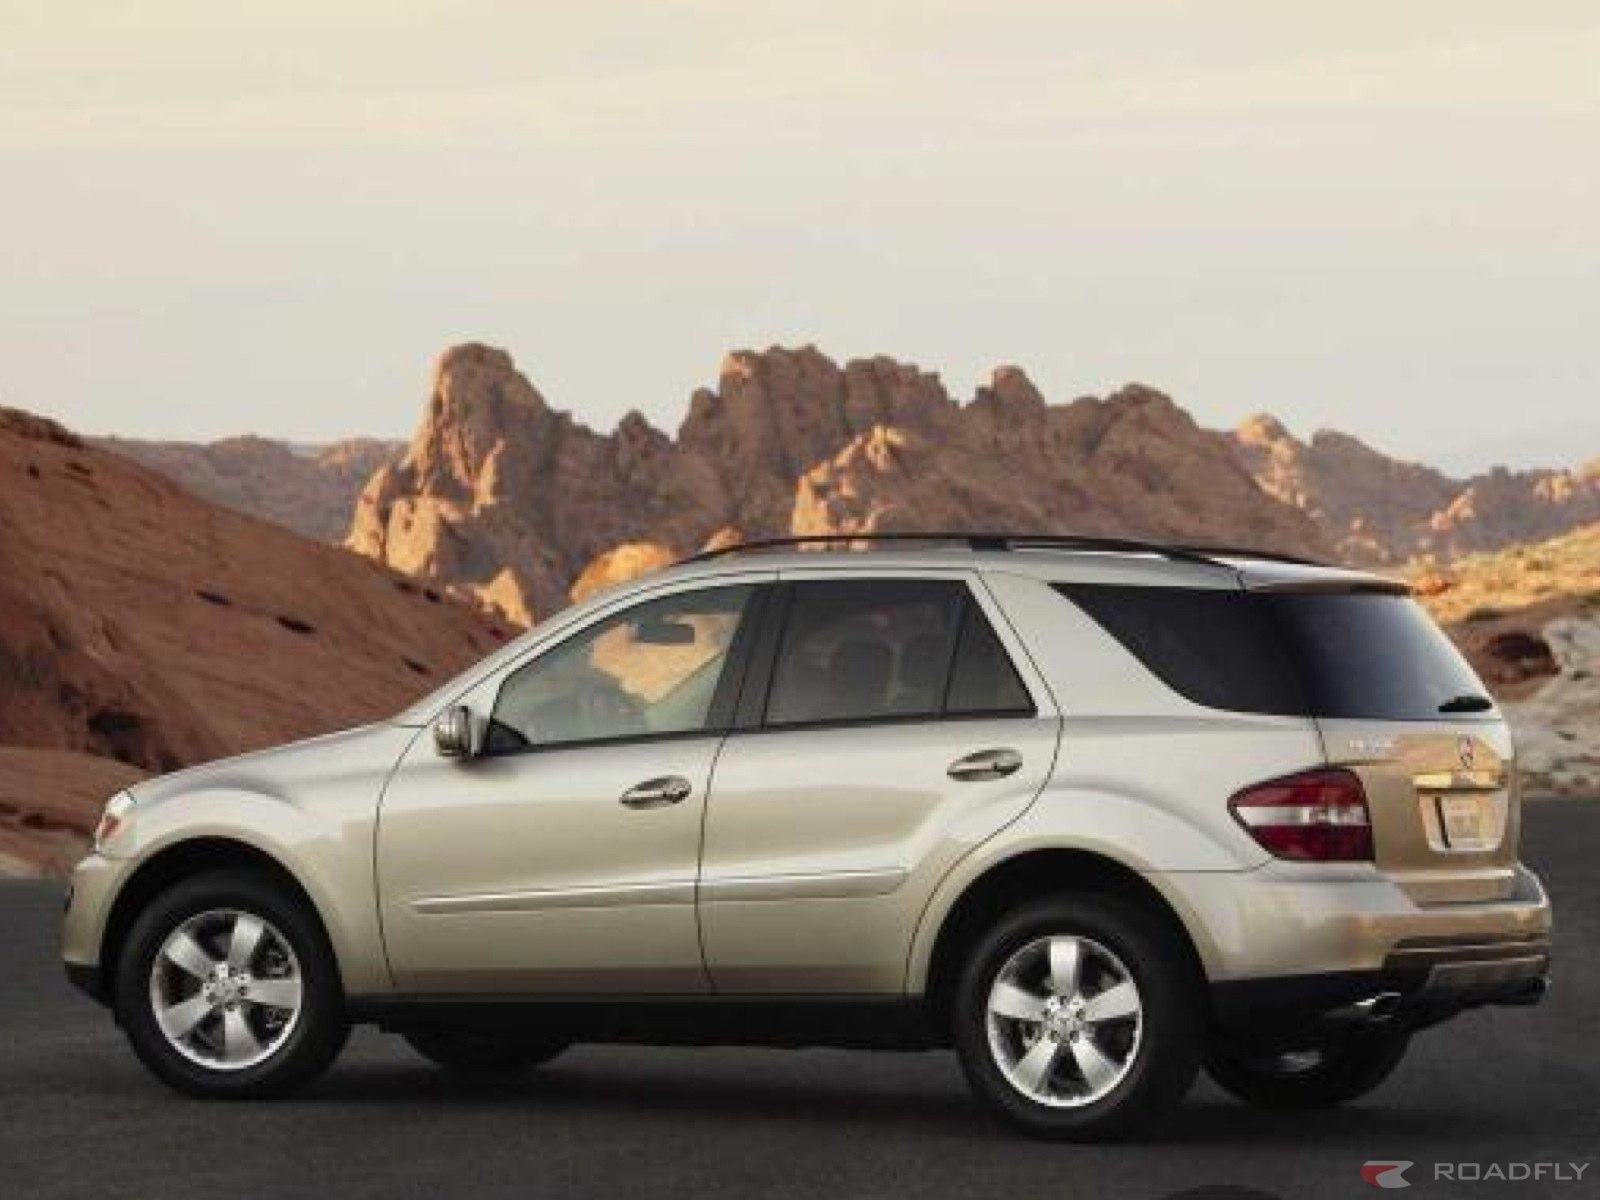 Mercedes benz ml 500 picture 4 reviews news specs for Ml500 mercedes benz